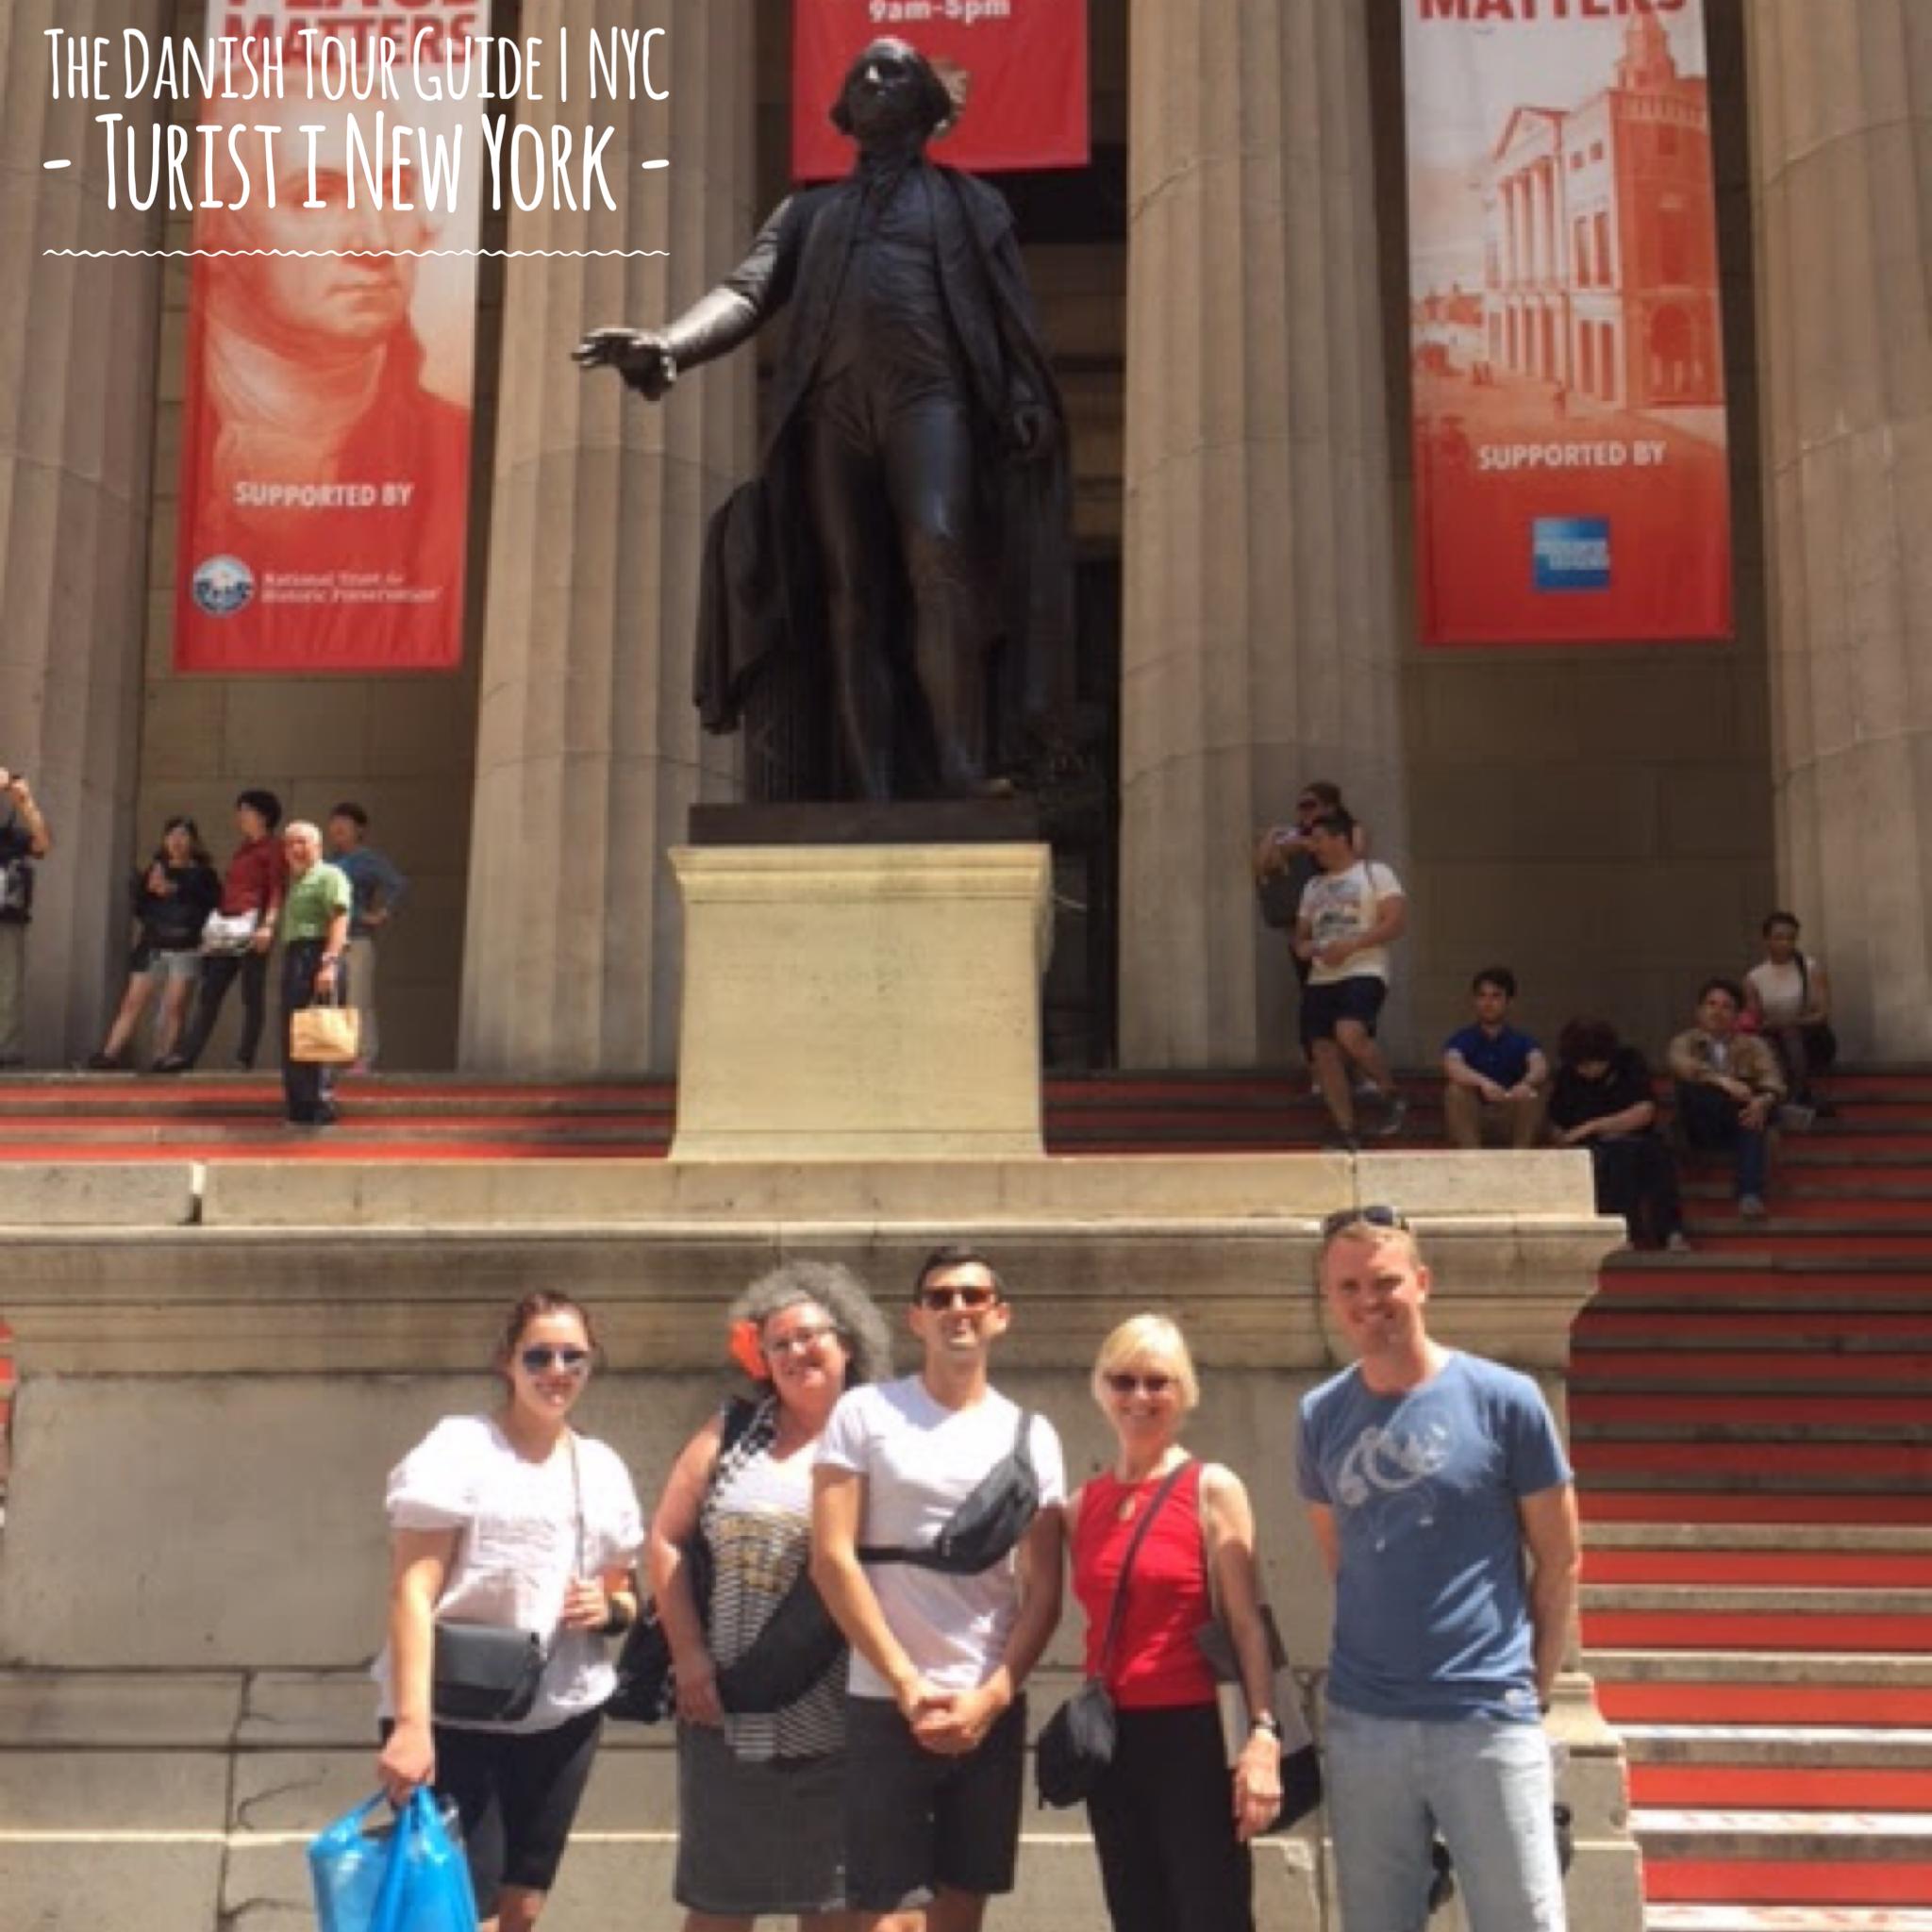 Turist i New York - The Danish Tour Guide